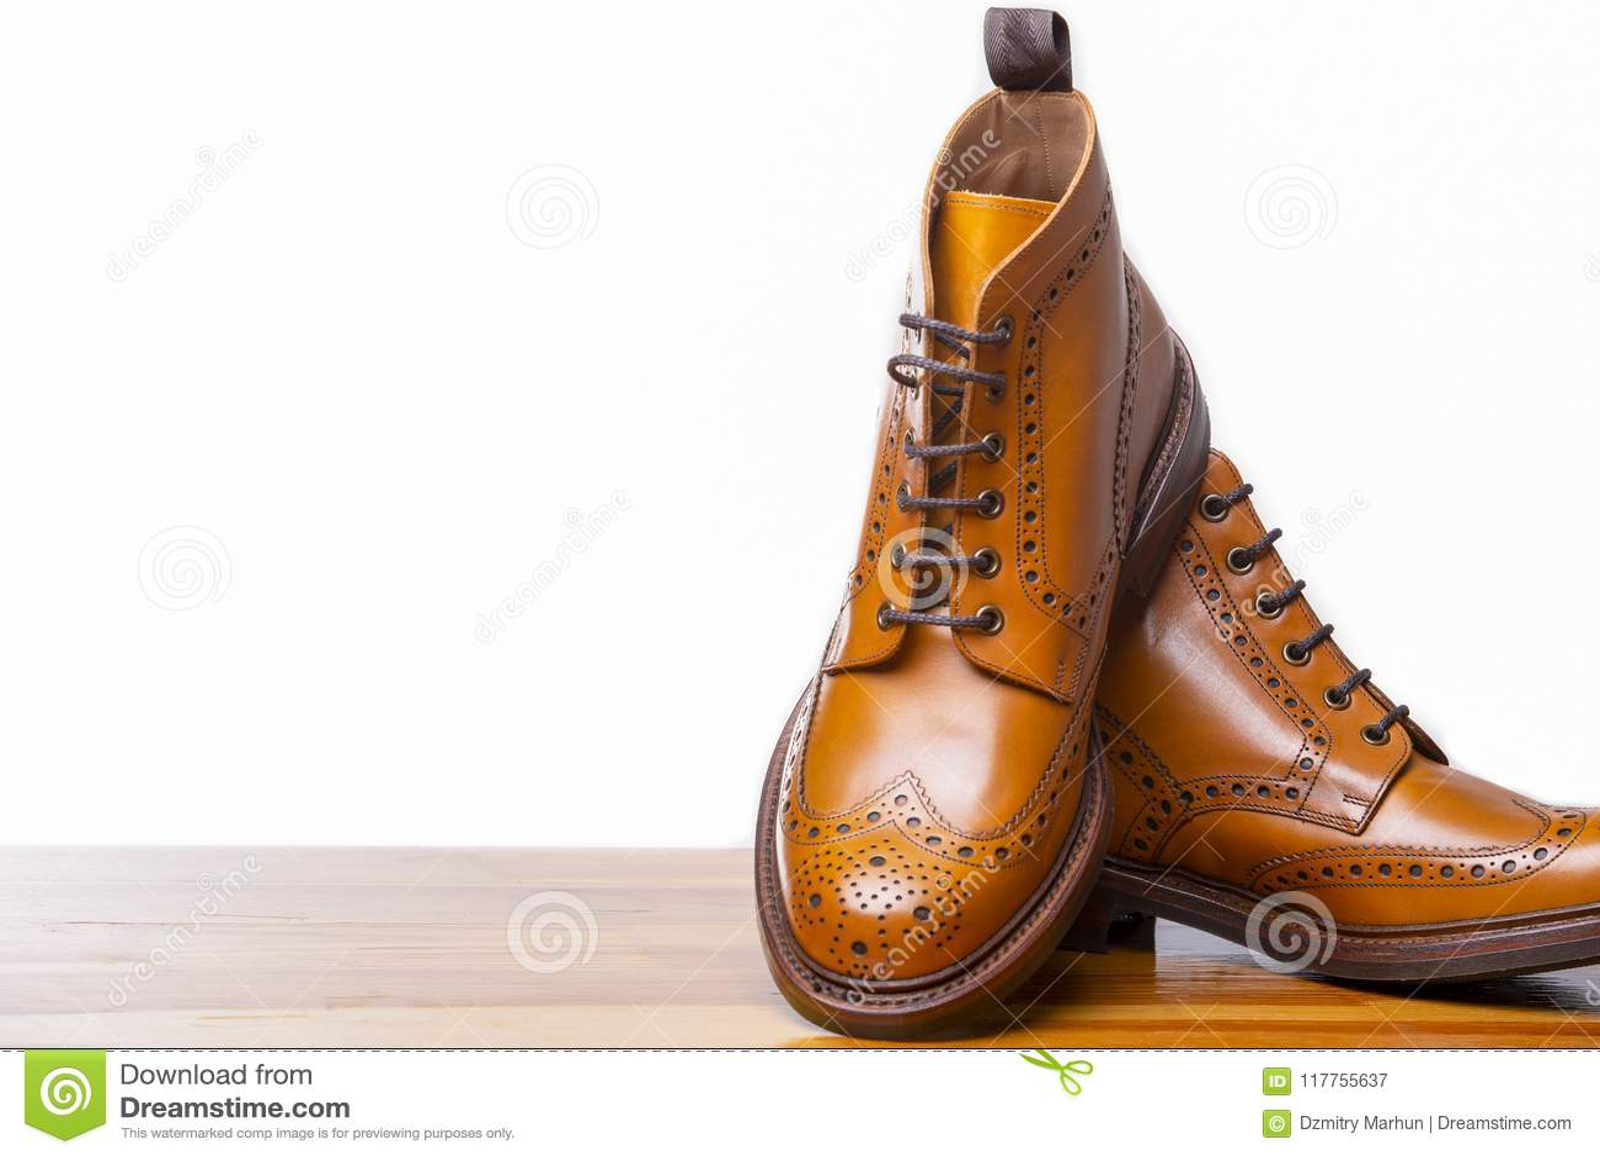 Footwear Concepts.Closeup of Pair of High Gentleman Tanned Brogues